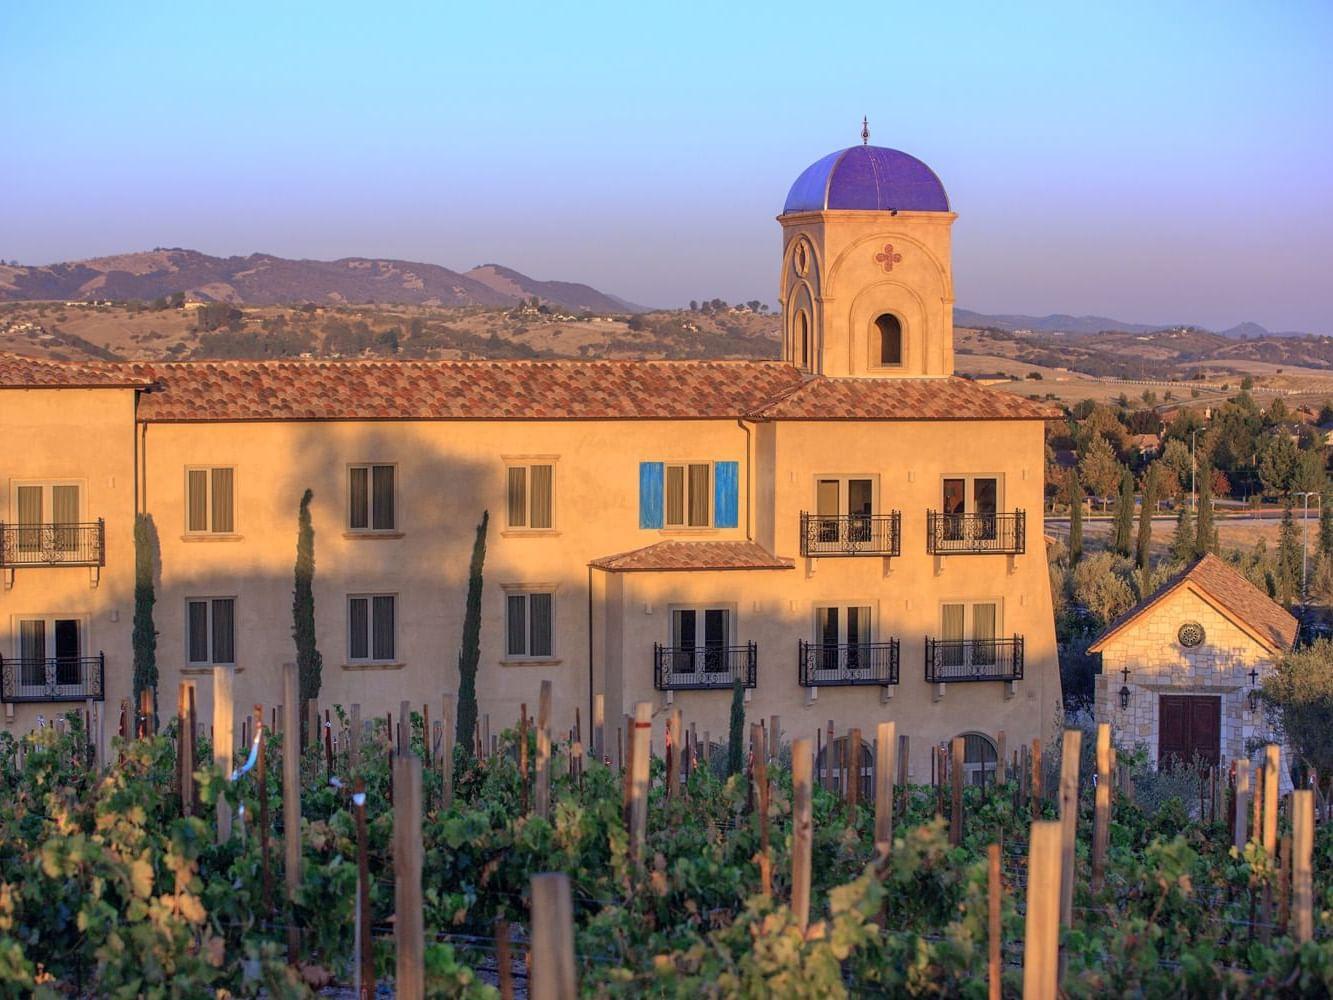 Vineyard view of exterior building